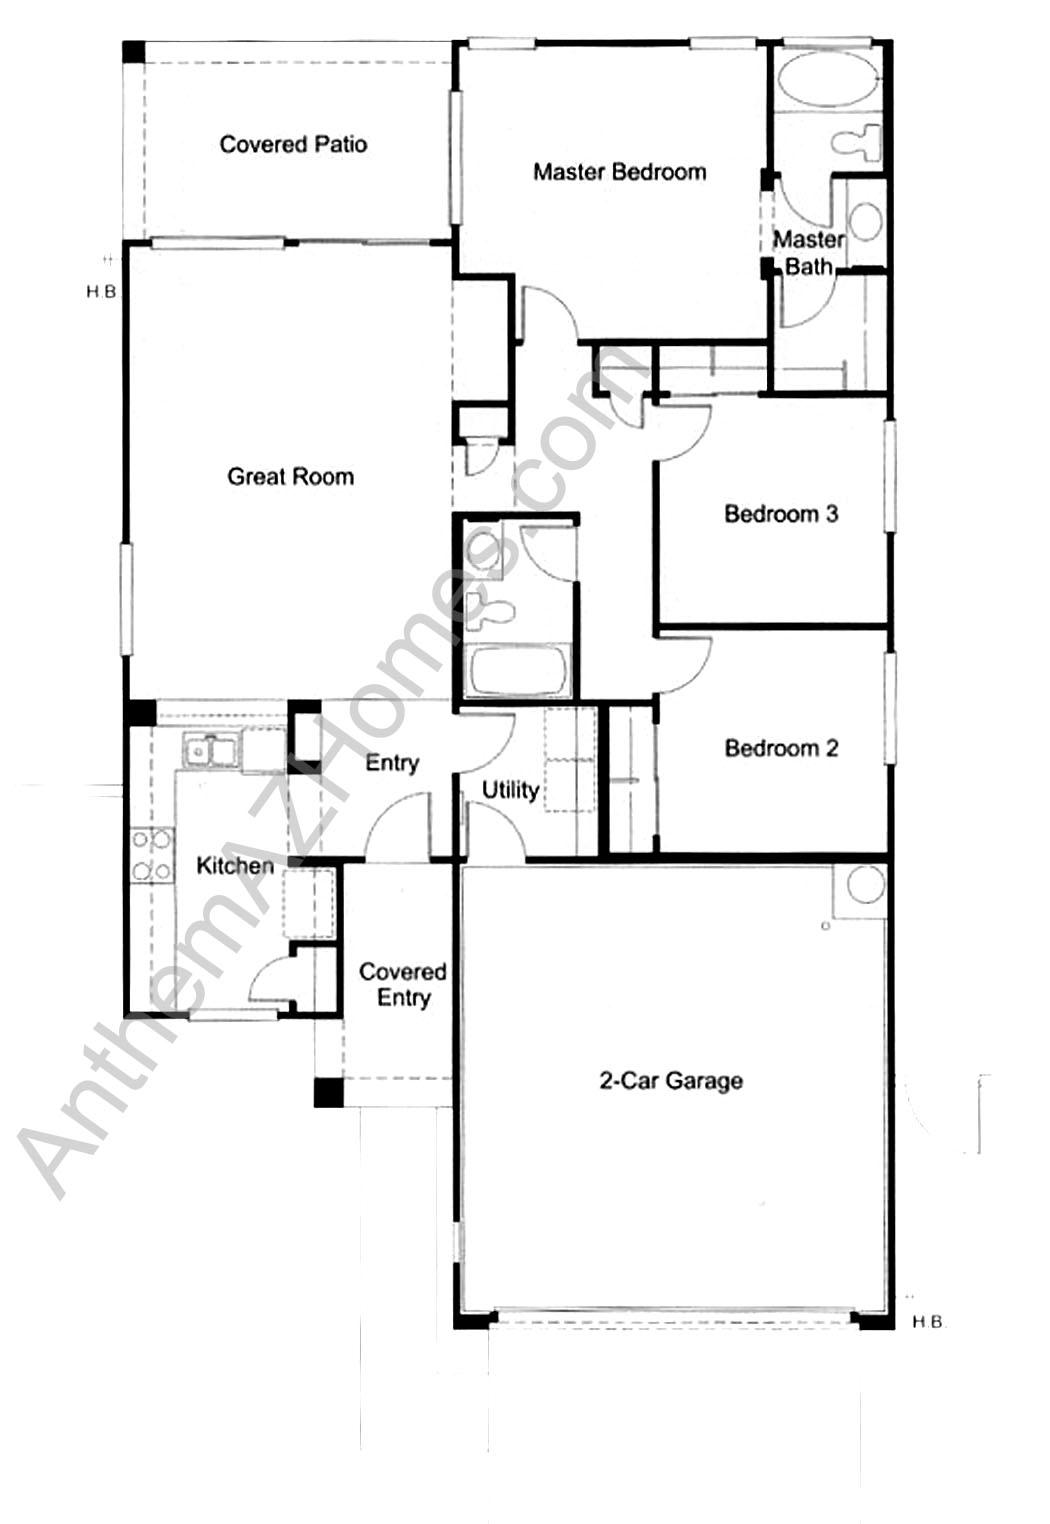 Anthem az house plans house plans for Arizona house plans